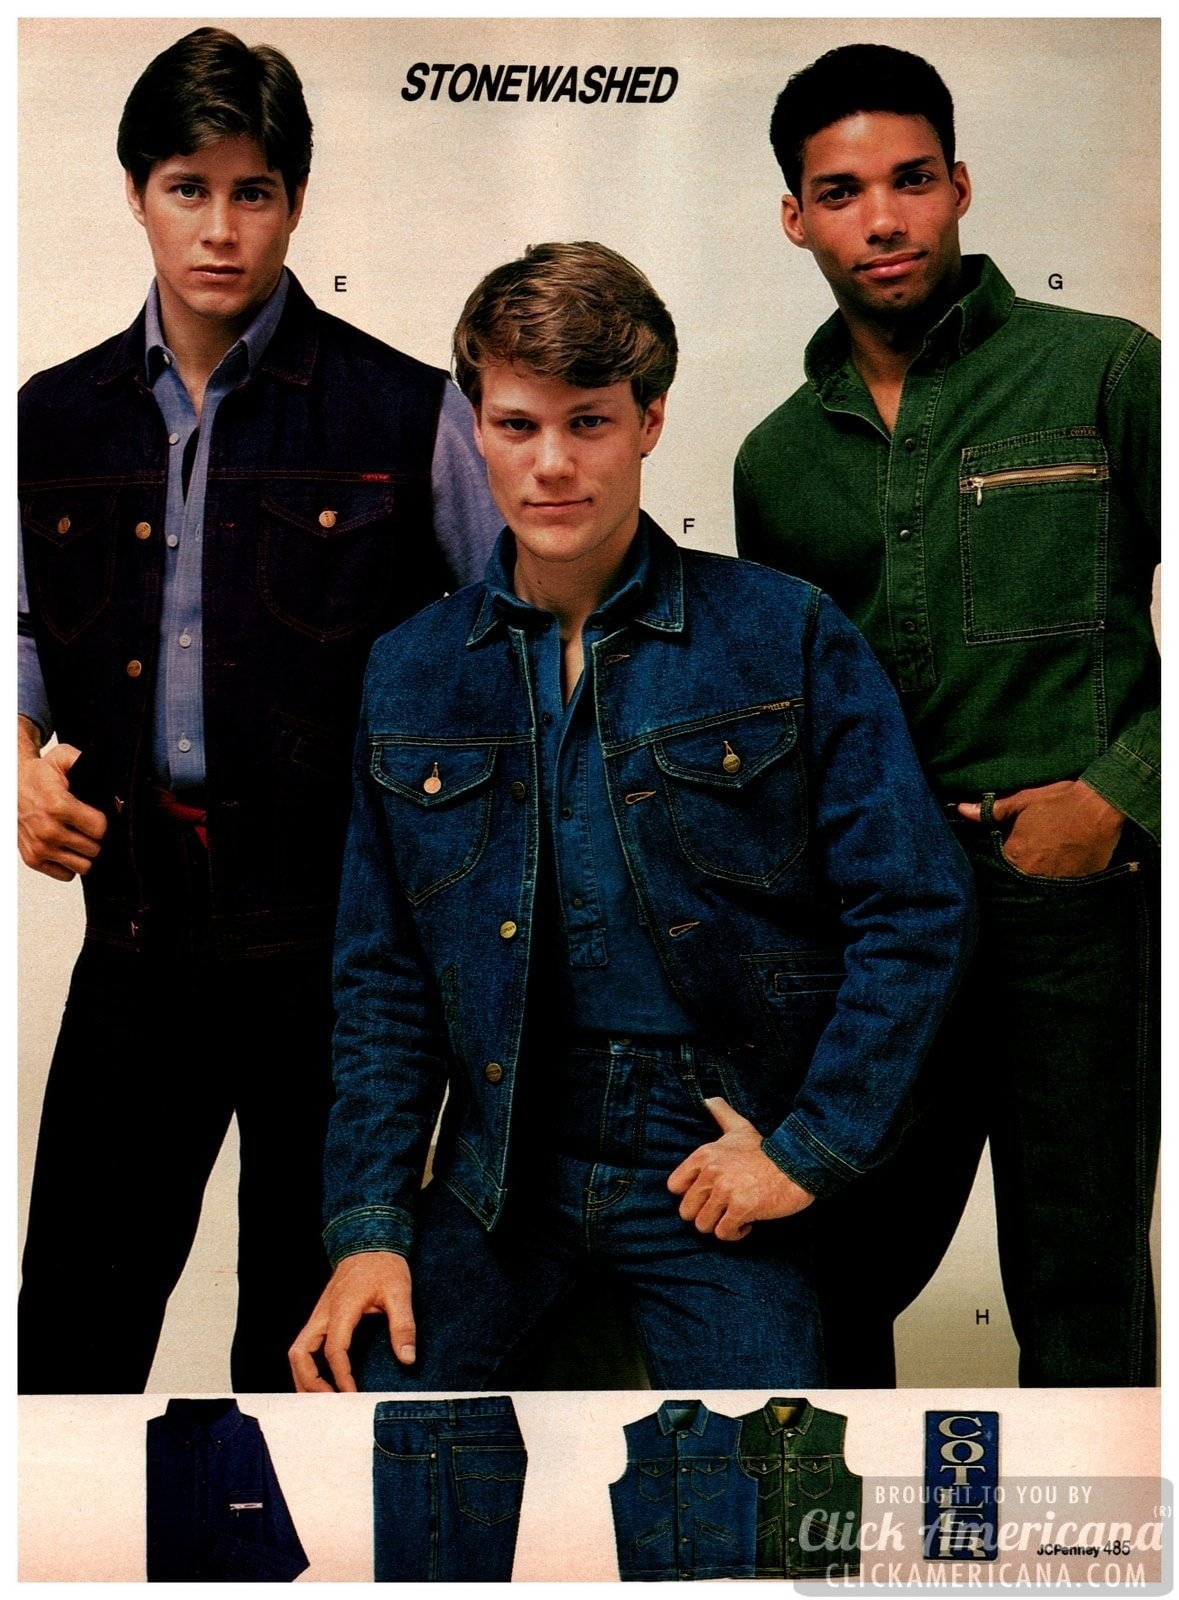 Retro stonewashed denim jackets, vests and jeans